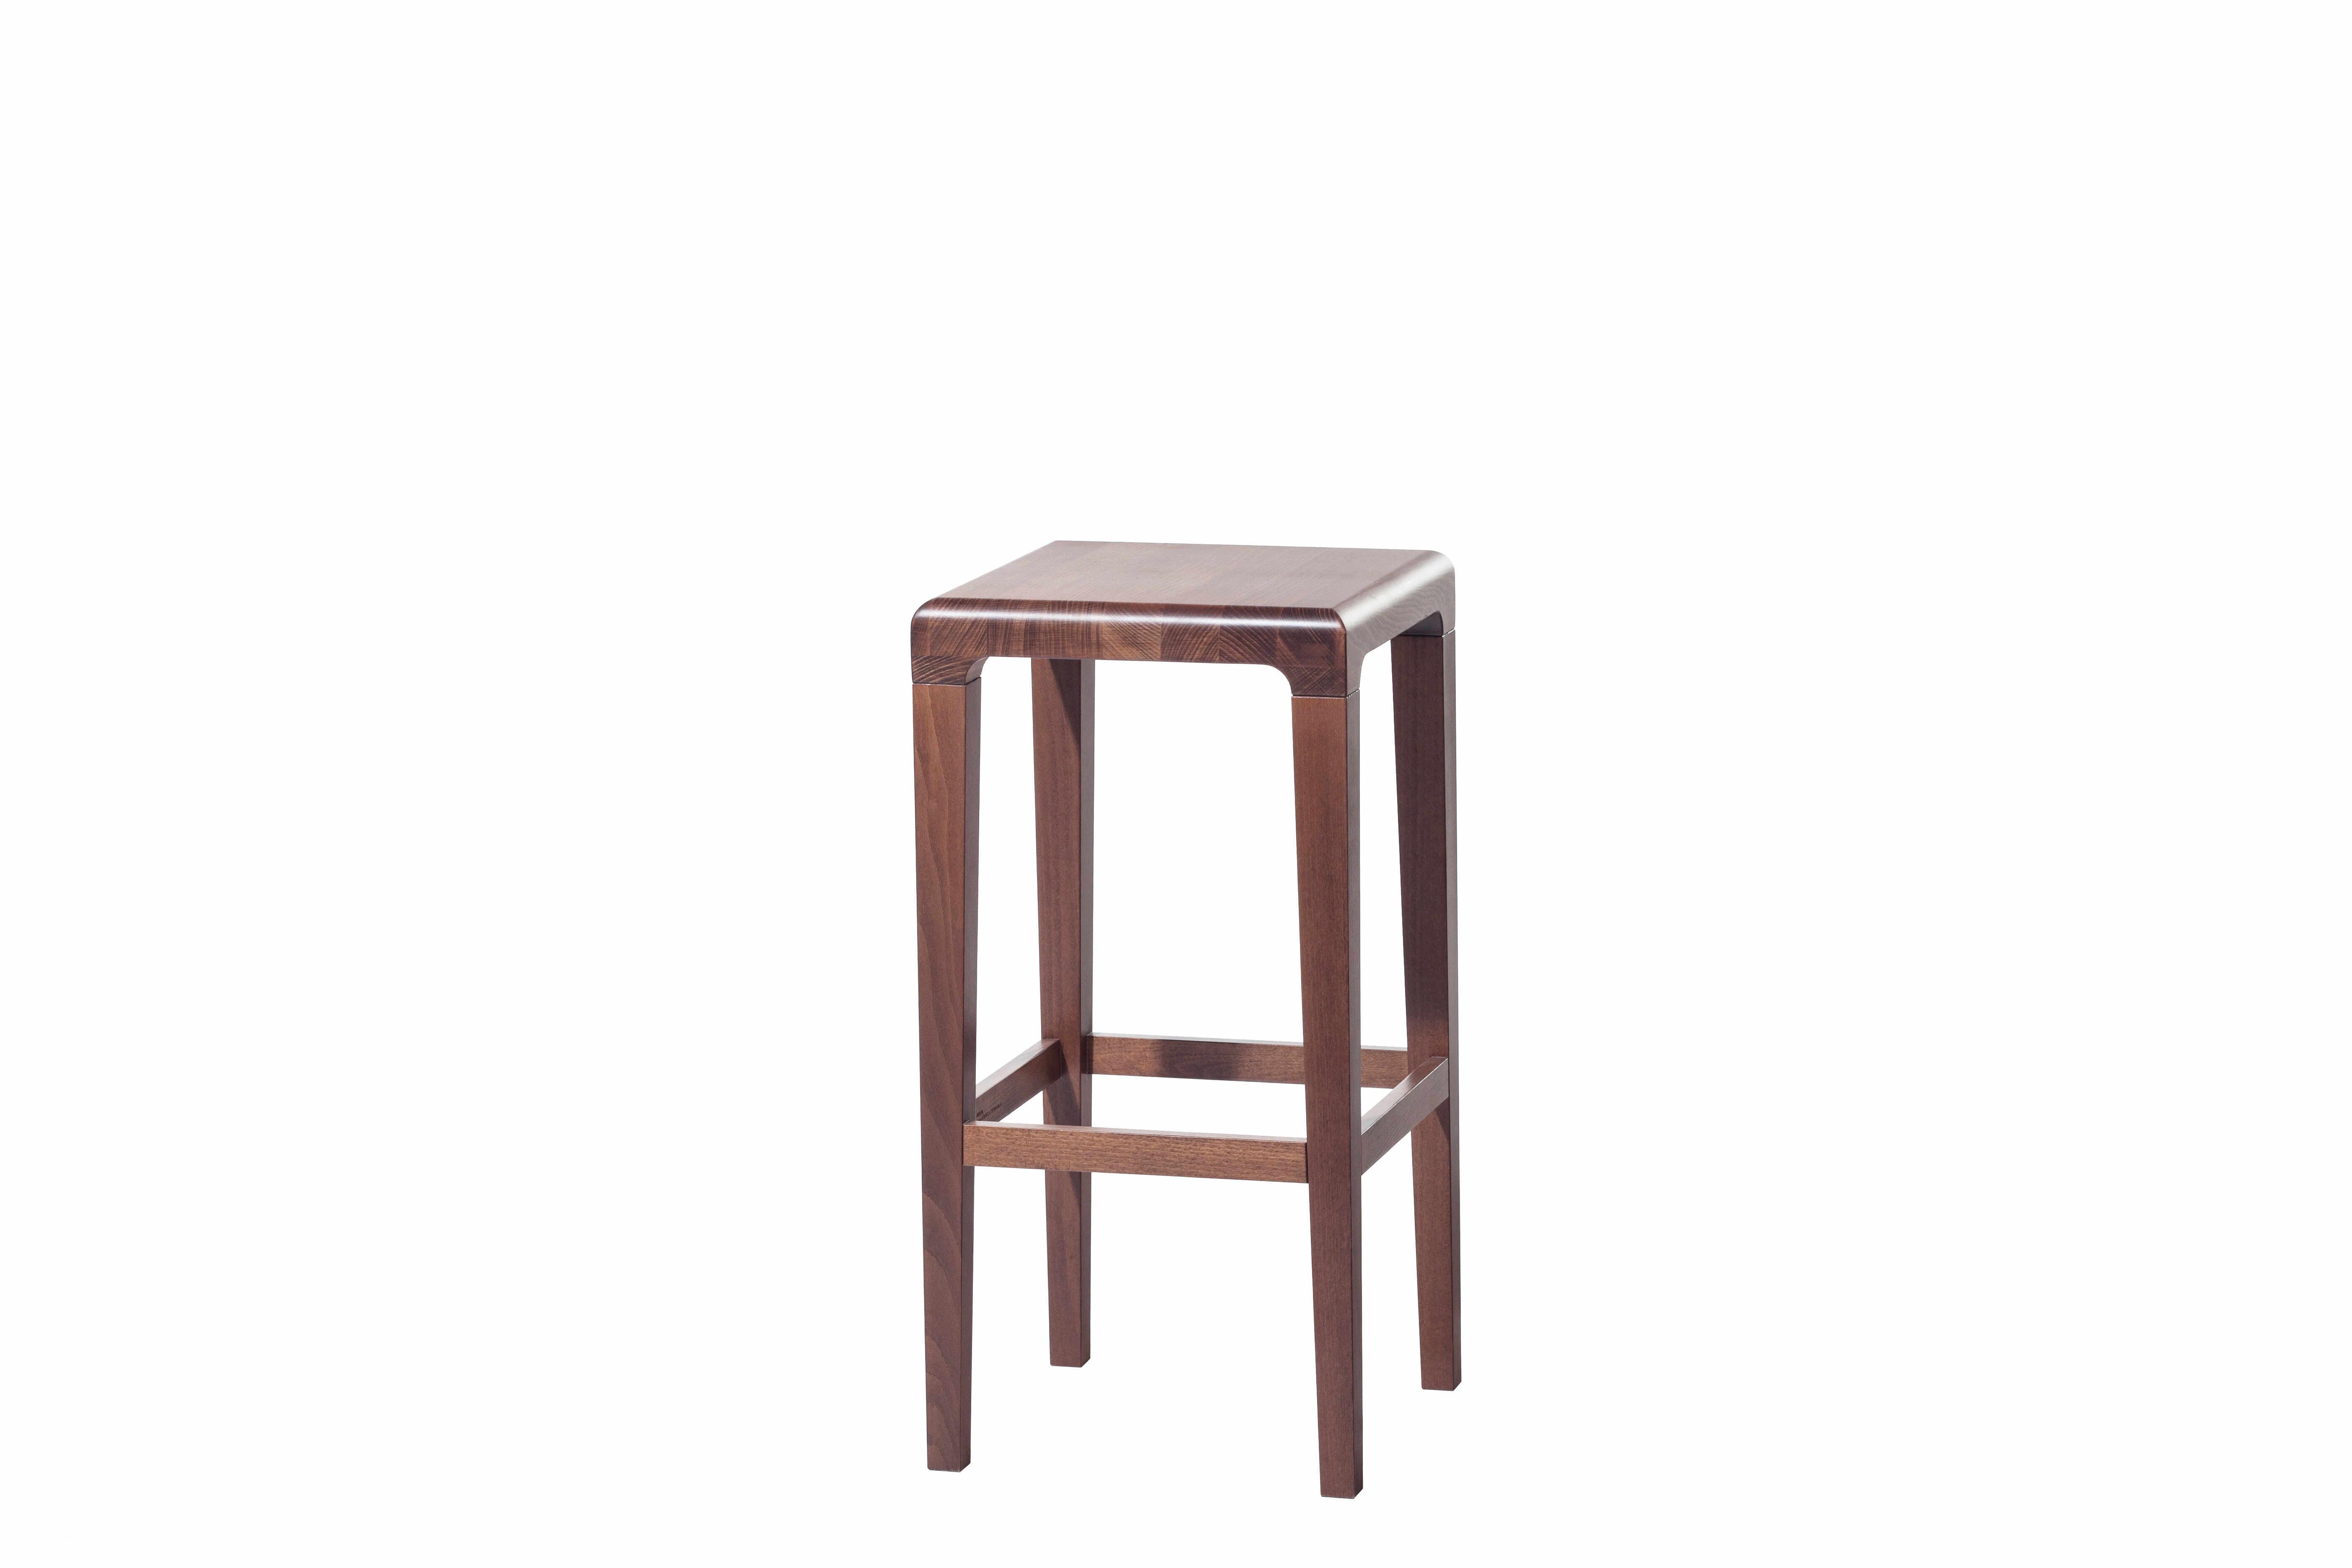 Scaun din lemn de stejar Rioja Brown Small, l32xA32xH64 cm la pret 1387 lei